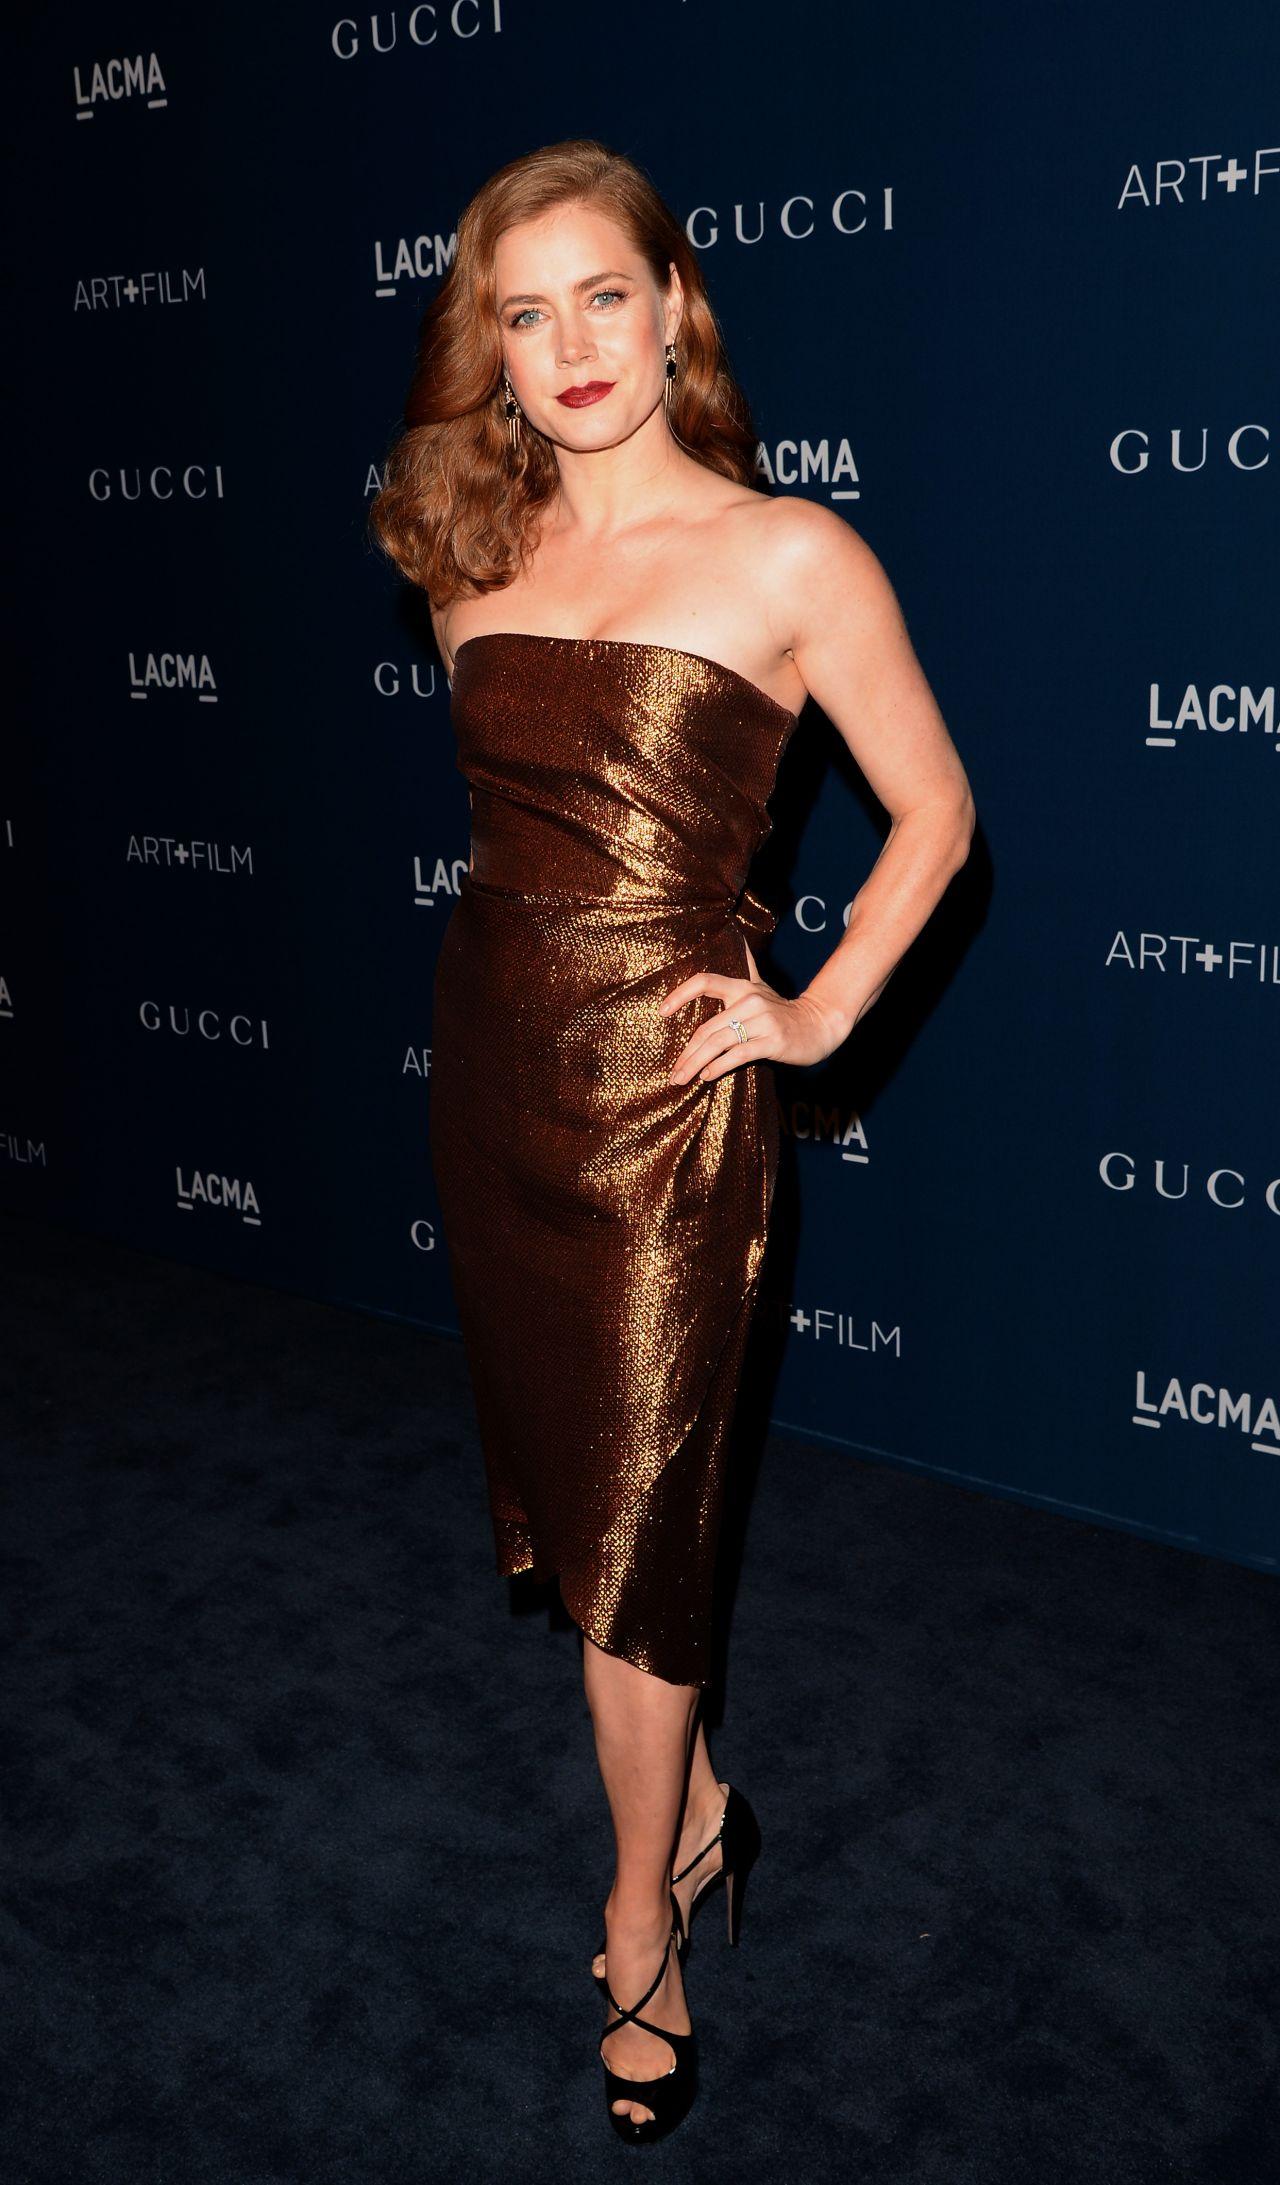 Amy Adams on Red Carpet - 2013 LACMA Art anc Film Gala in